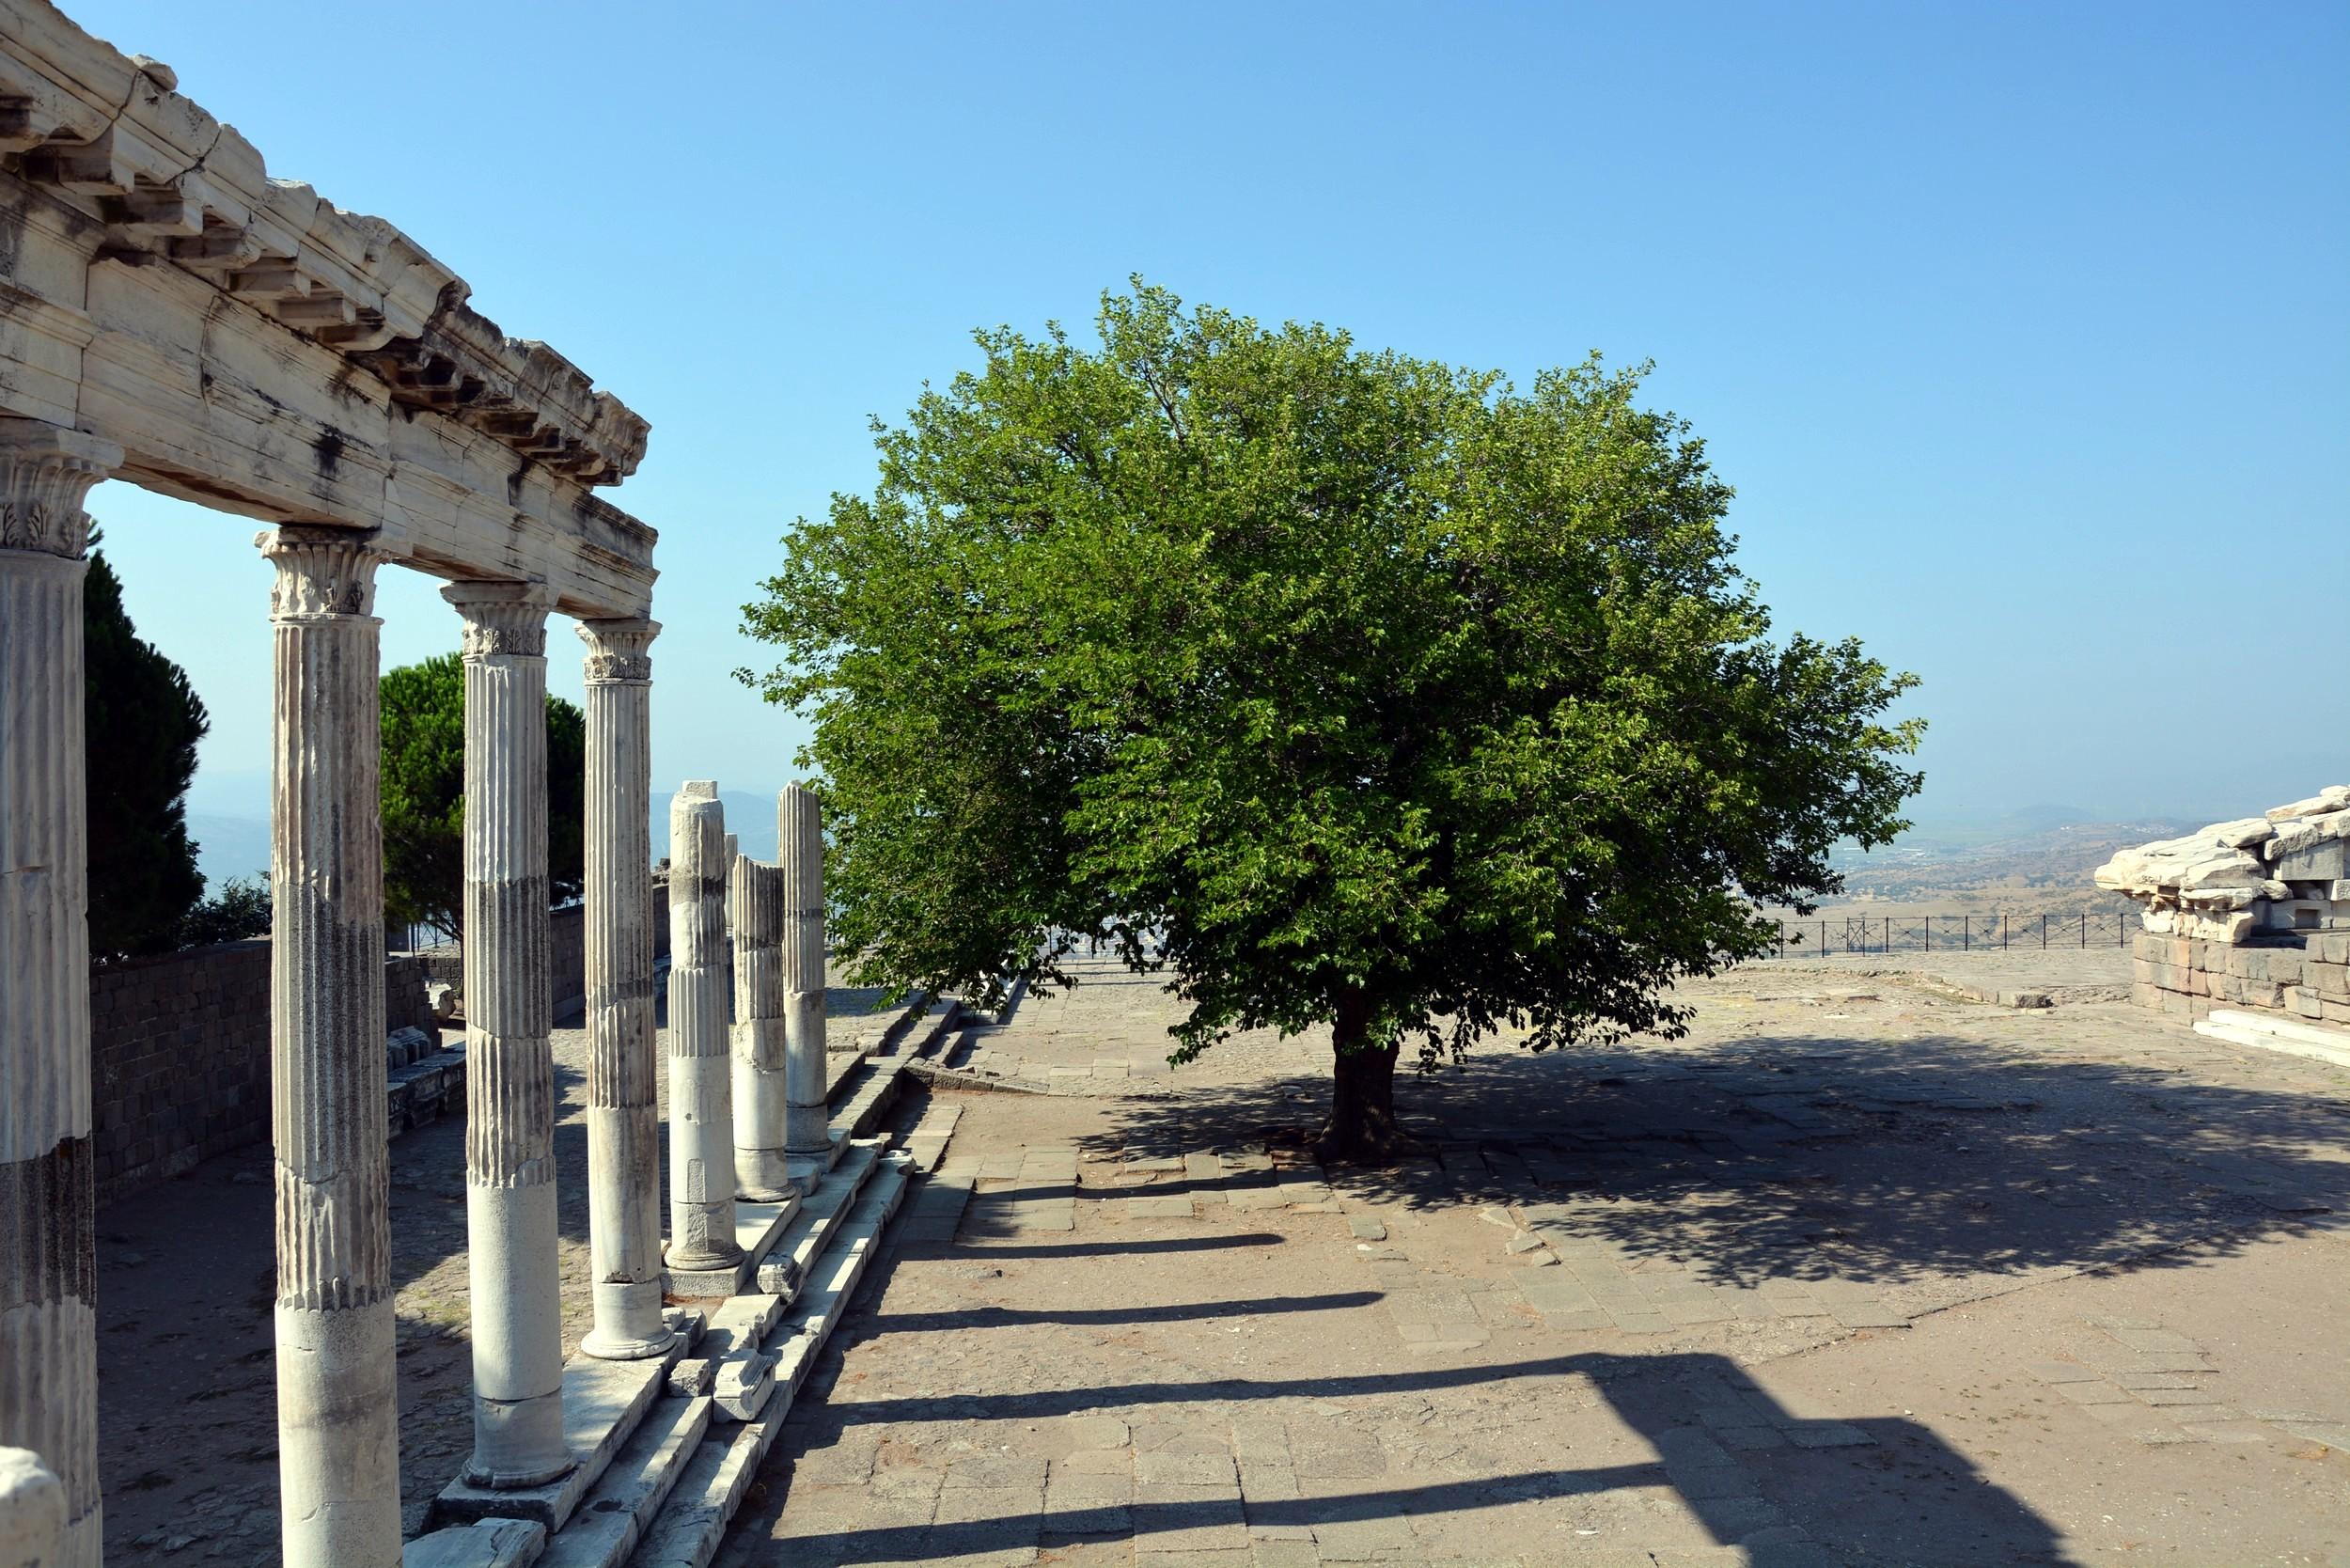 Pergamon, the sanctuary of Trajan